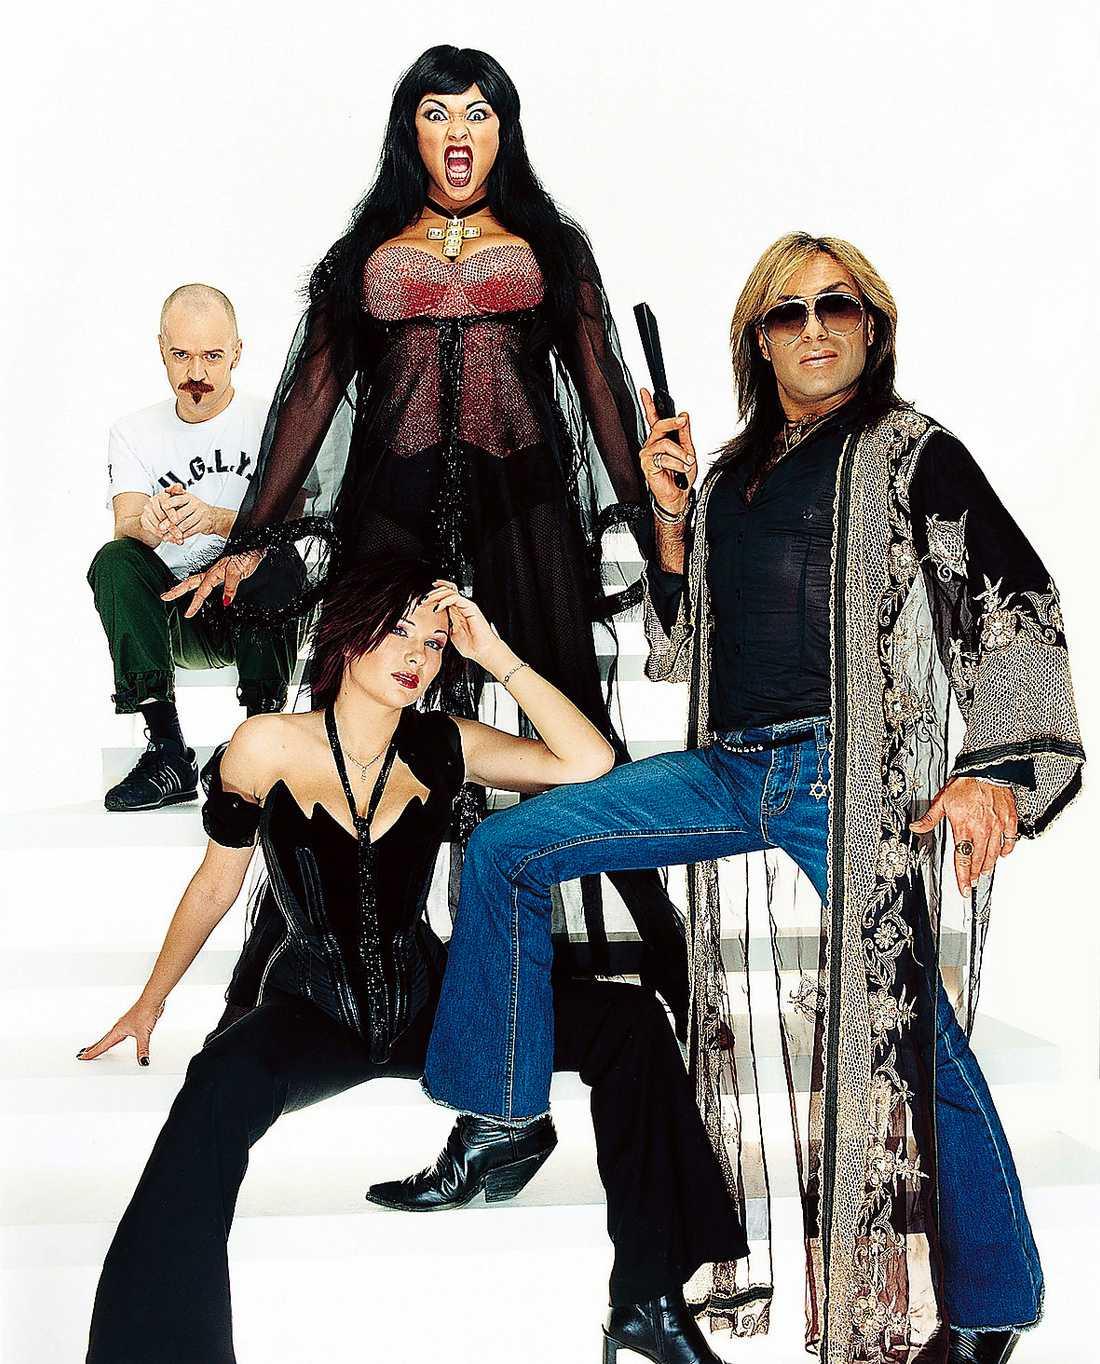 Alexander Bard, Camilla Henemark, Dominika Peczynski och Jean-Pierre Barda i Army of Lovers.